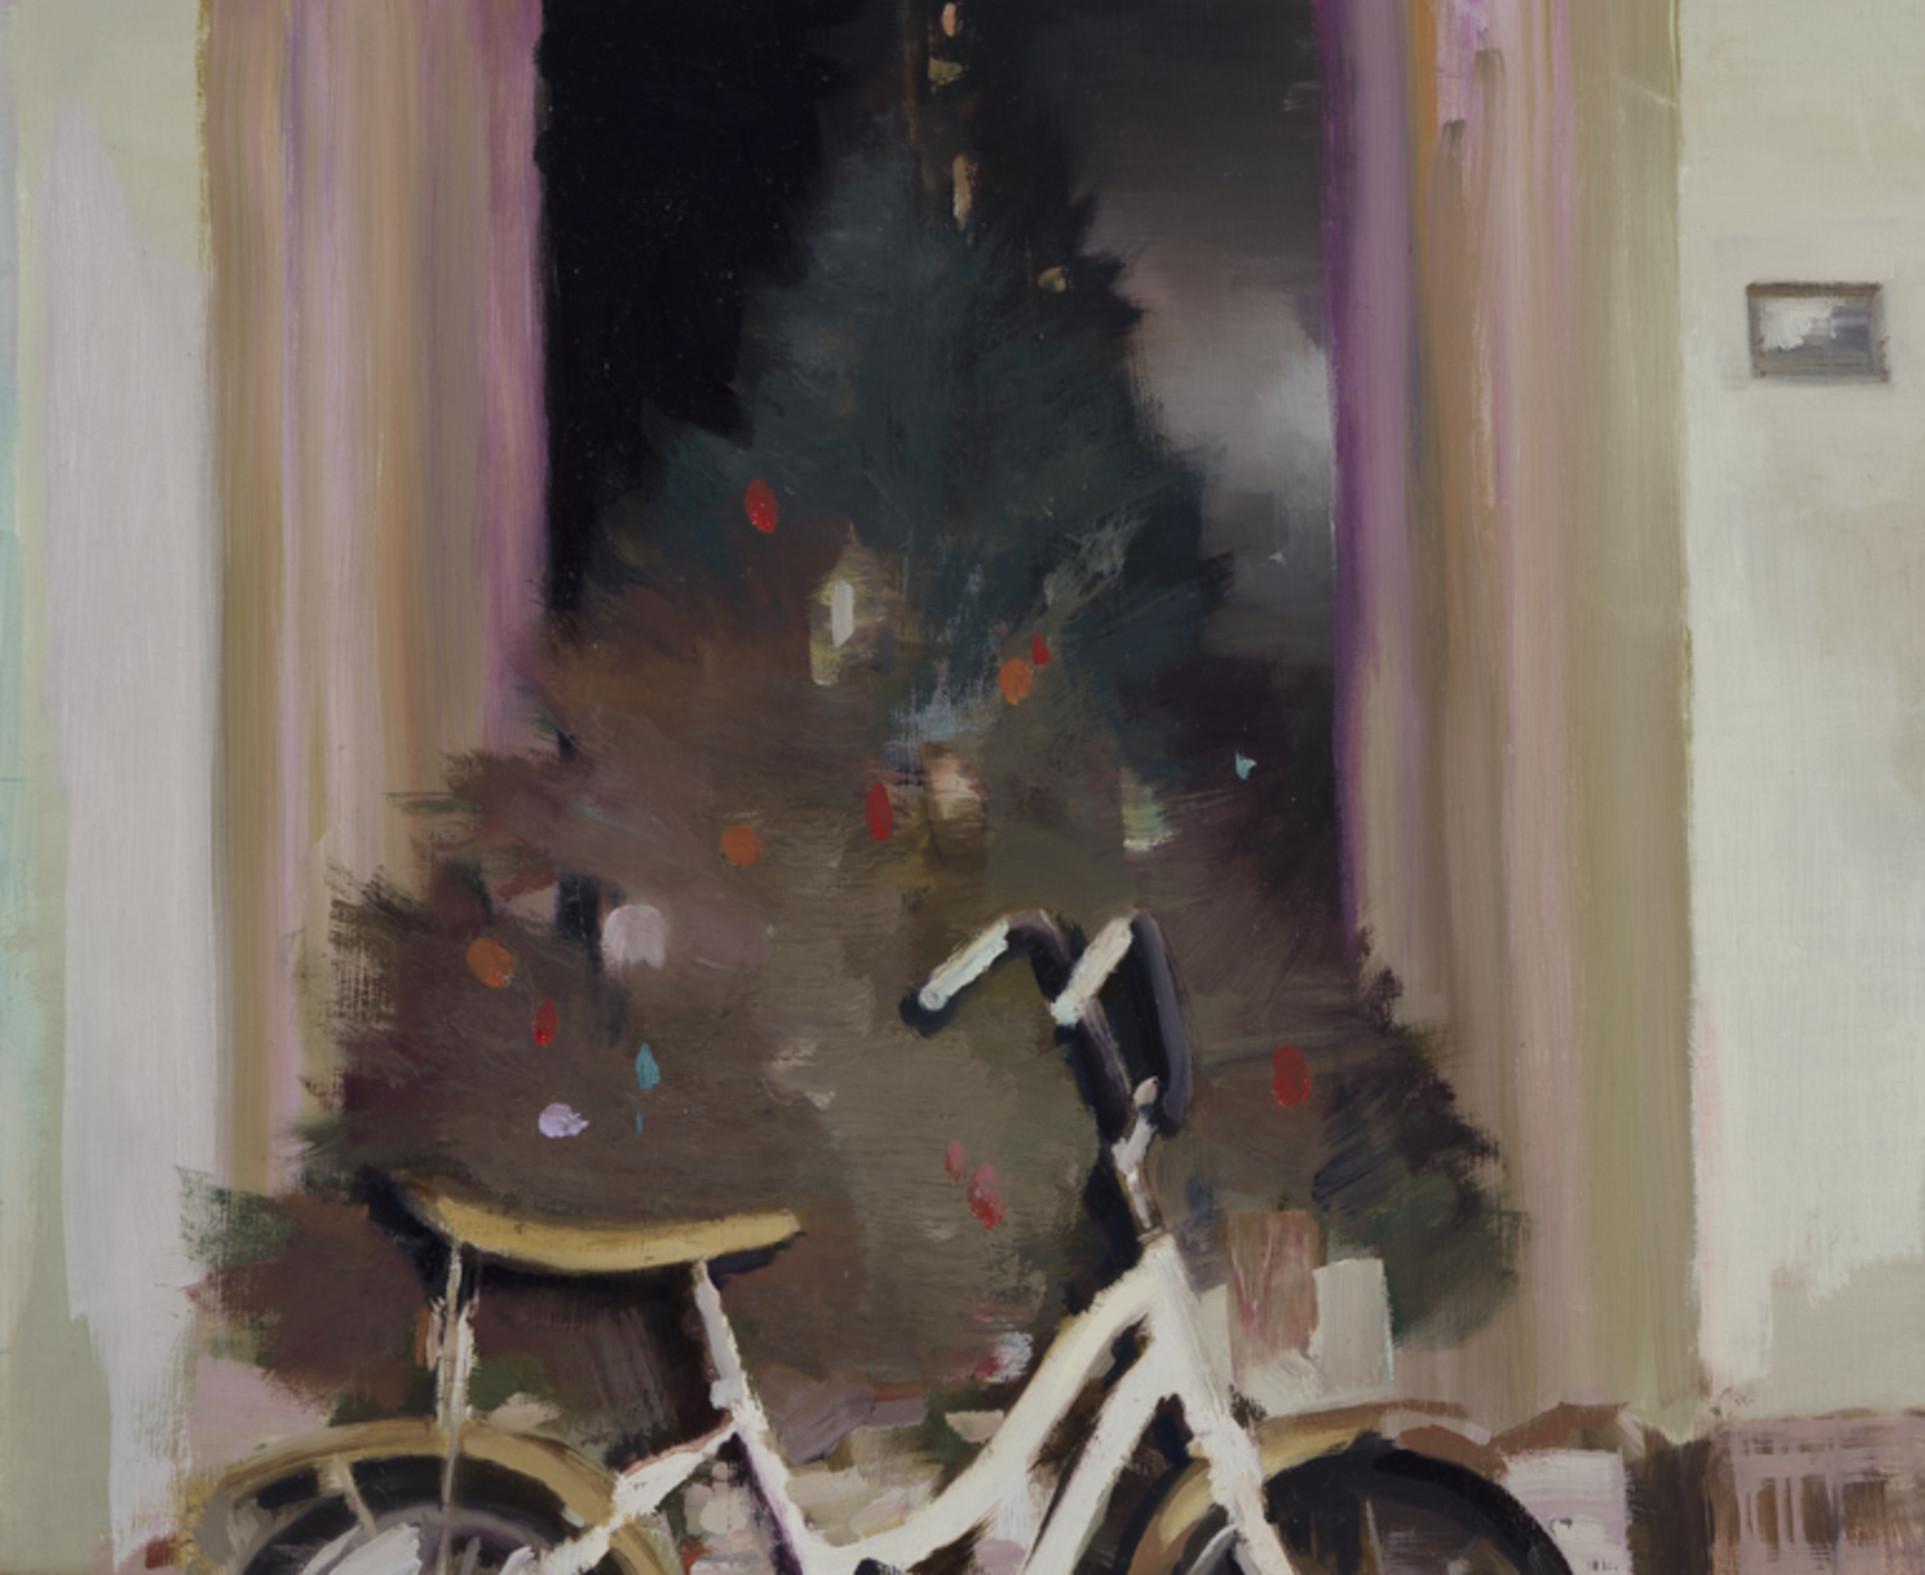 Kim Cogan, The Gift, 2017